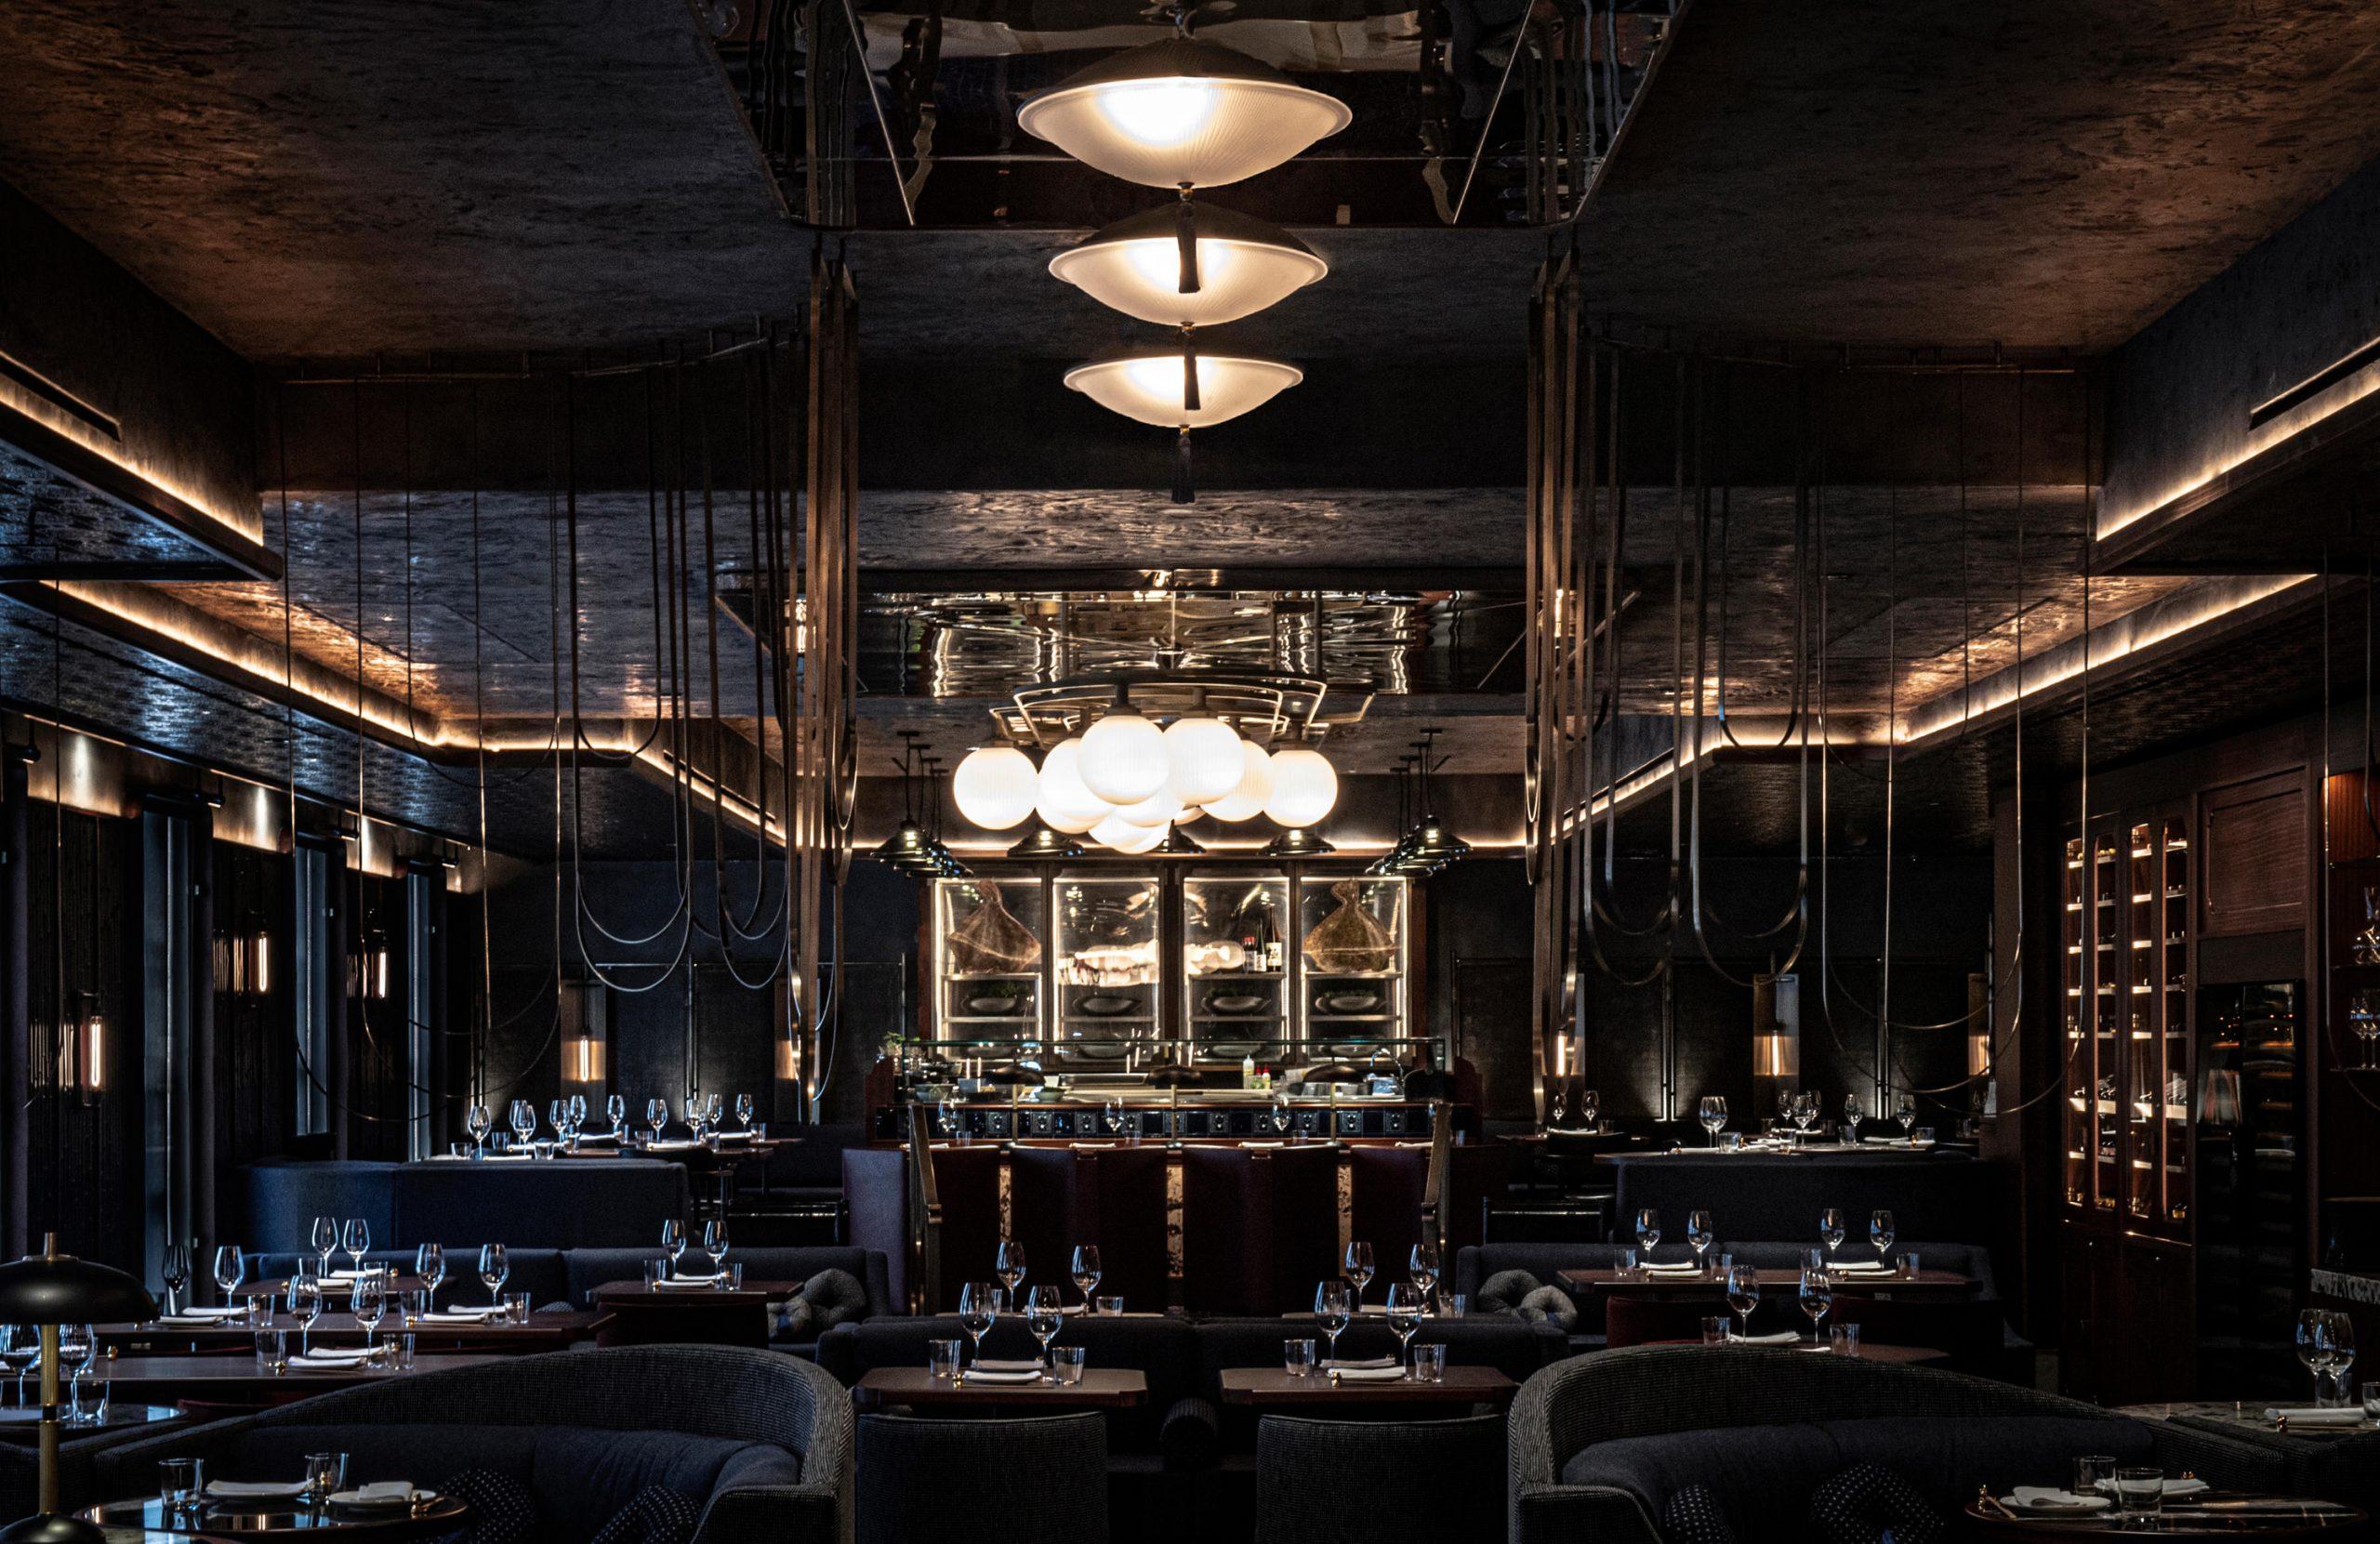 Gordon Ramsay's Lucky Cat Restaurant